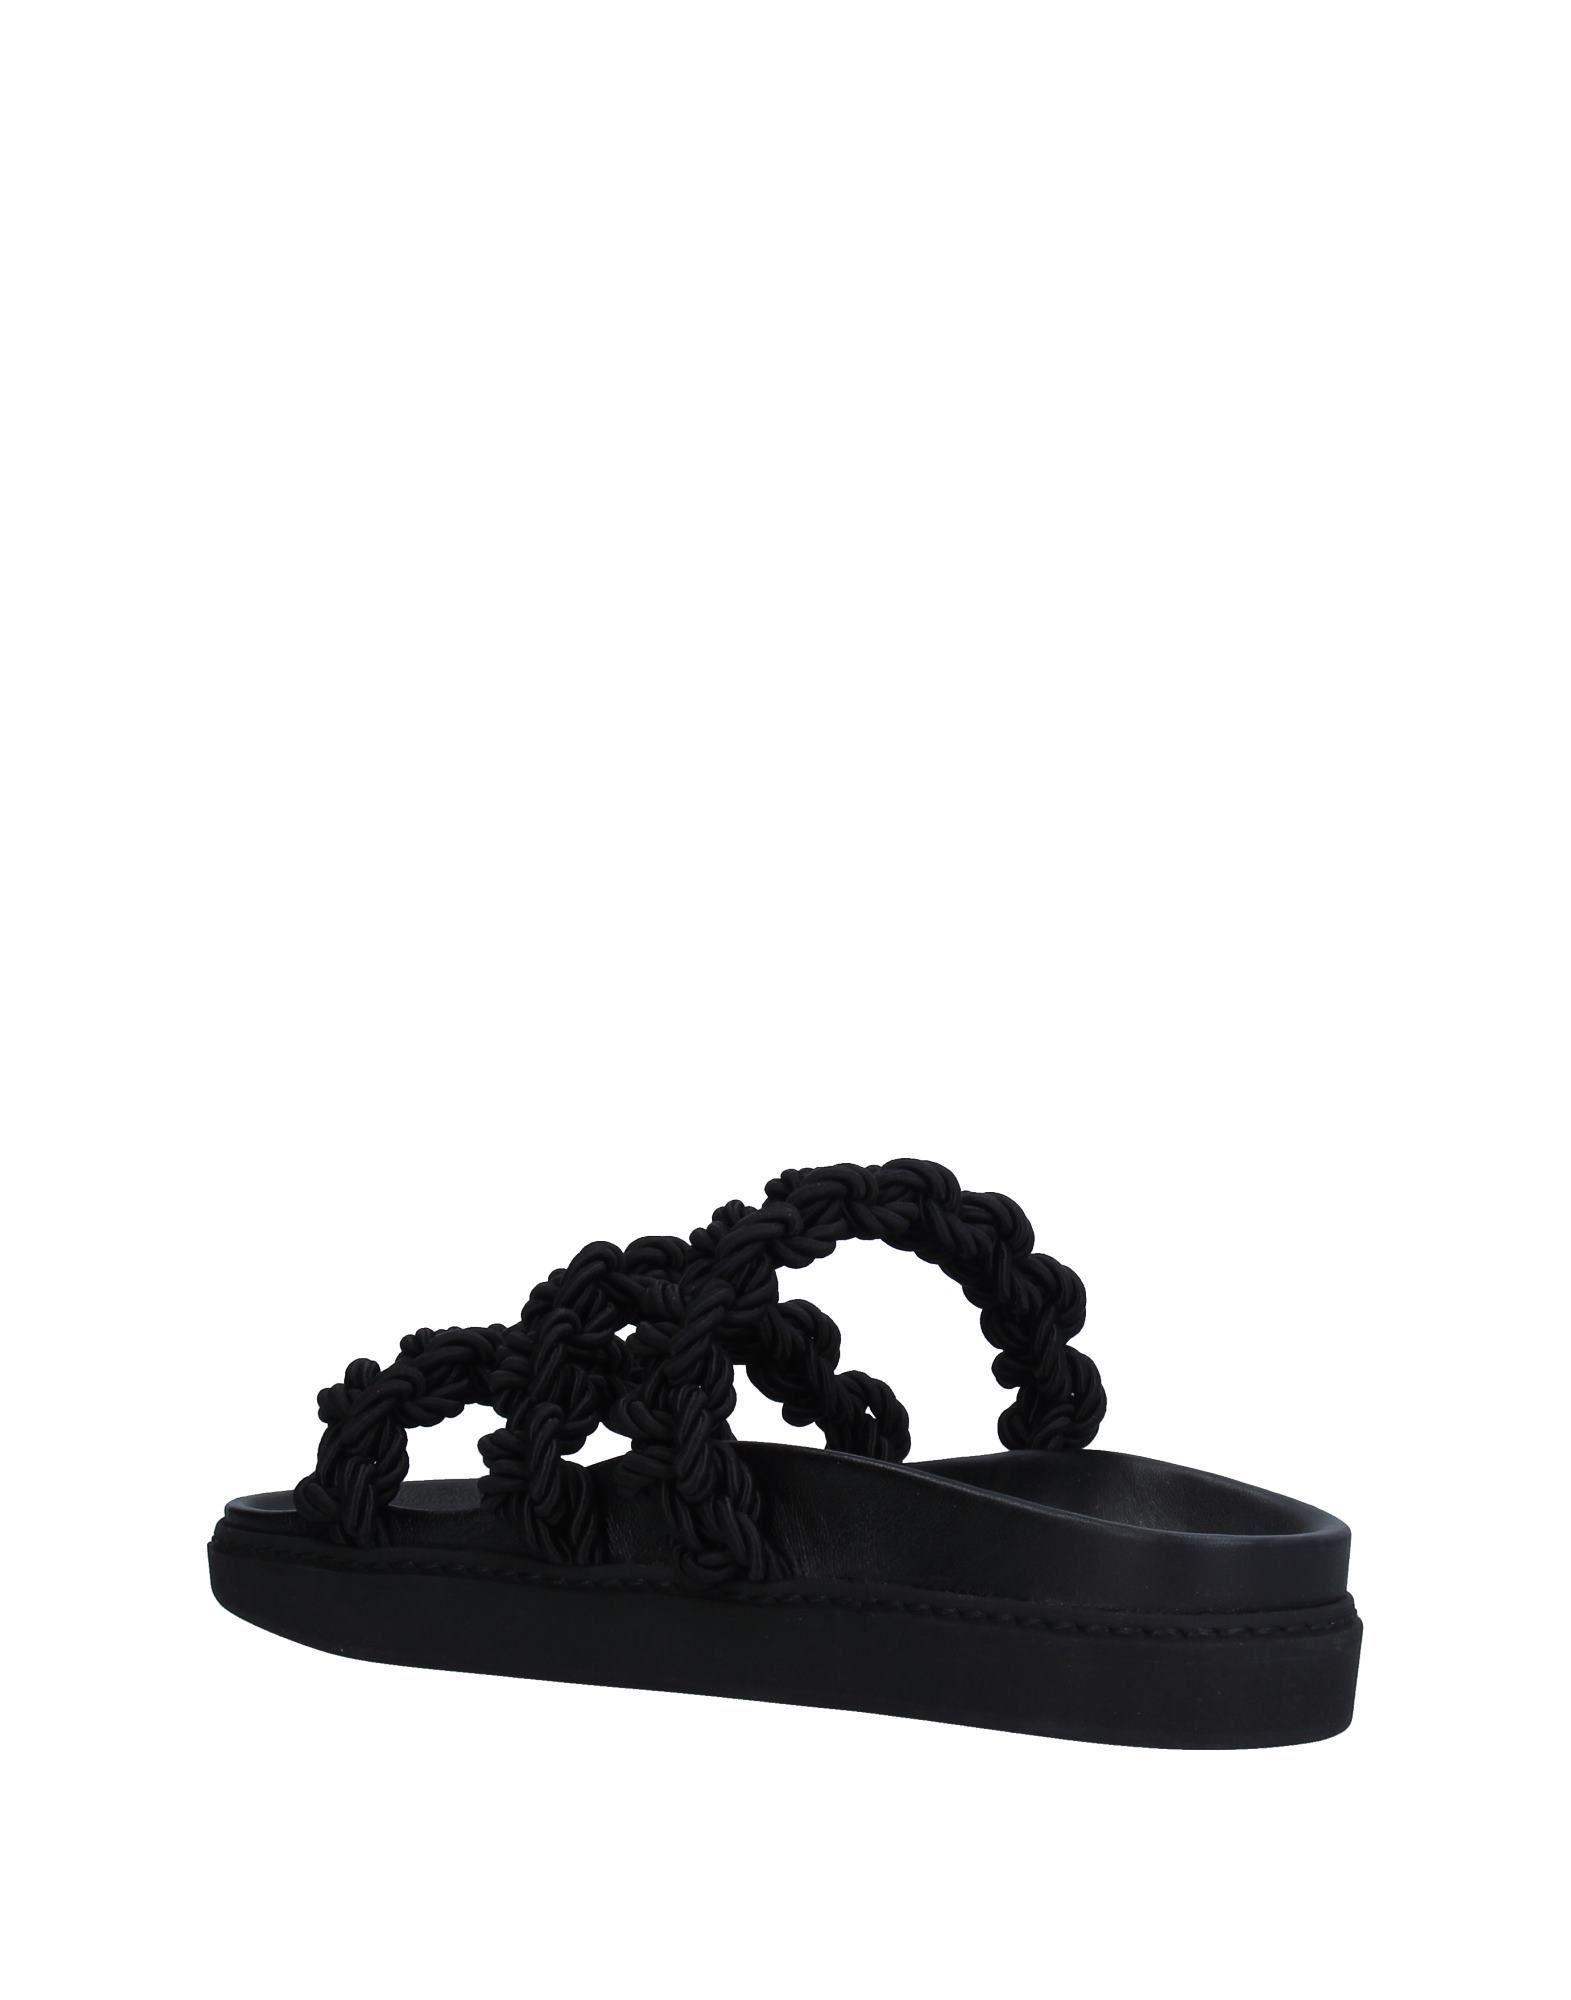 0d5b85214967f ... Lyst - Simone Rocha Sandals in Black best deals on 8115e c9a72  Lyst - Dolce  Gabbana Pvc Striped Criss Cross ...